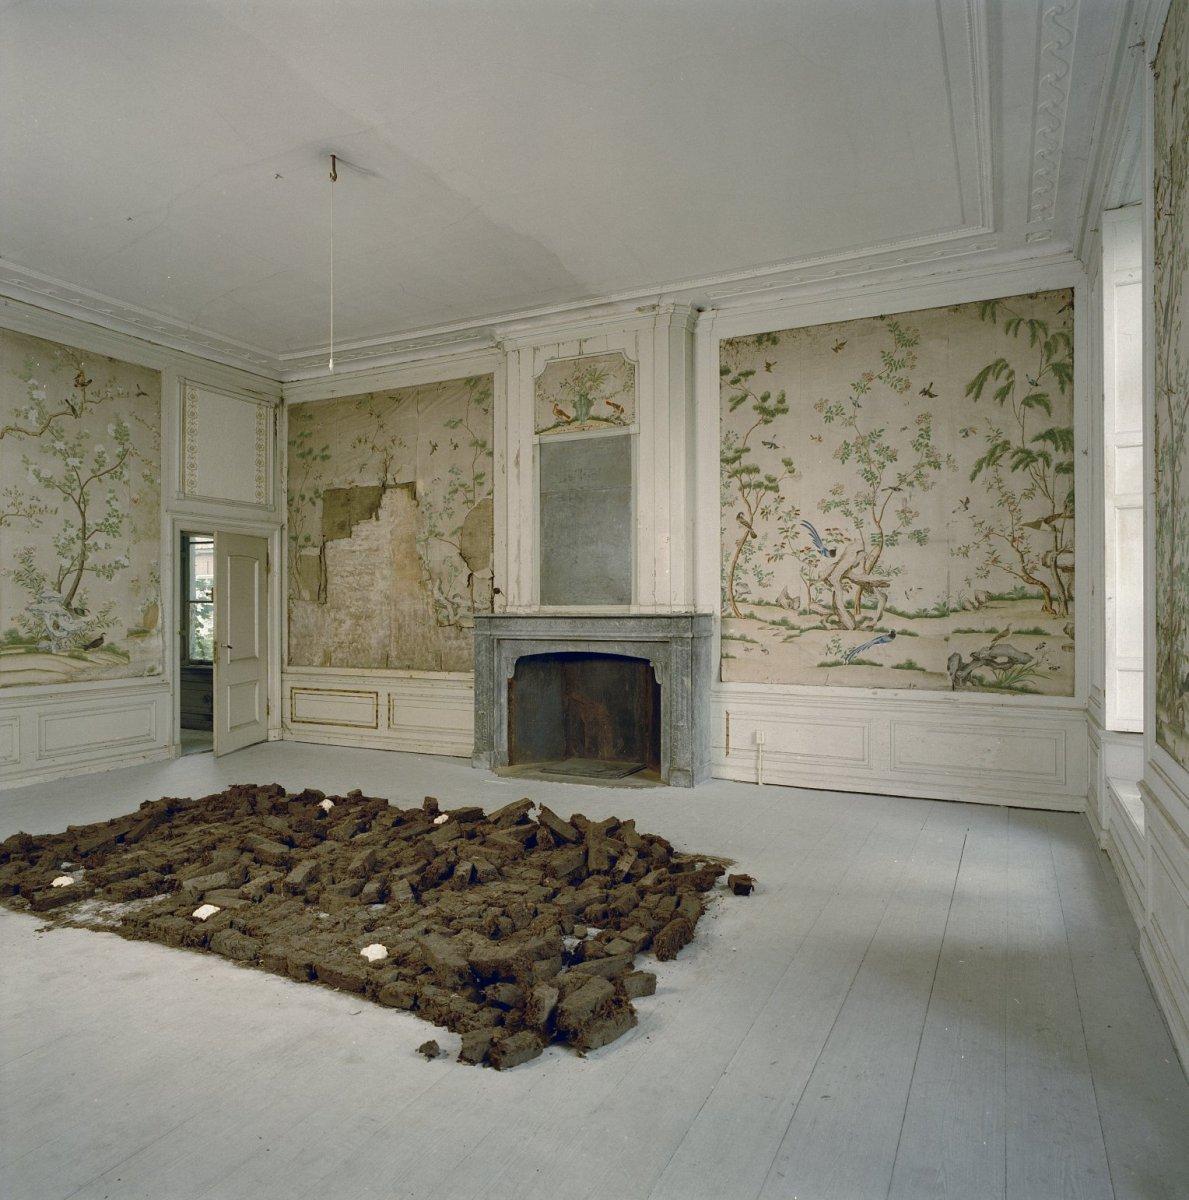 Overig in bunnik monument - Interieur oud huis gerenoveerd ...